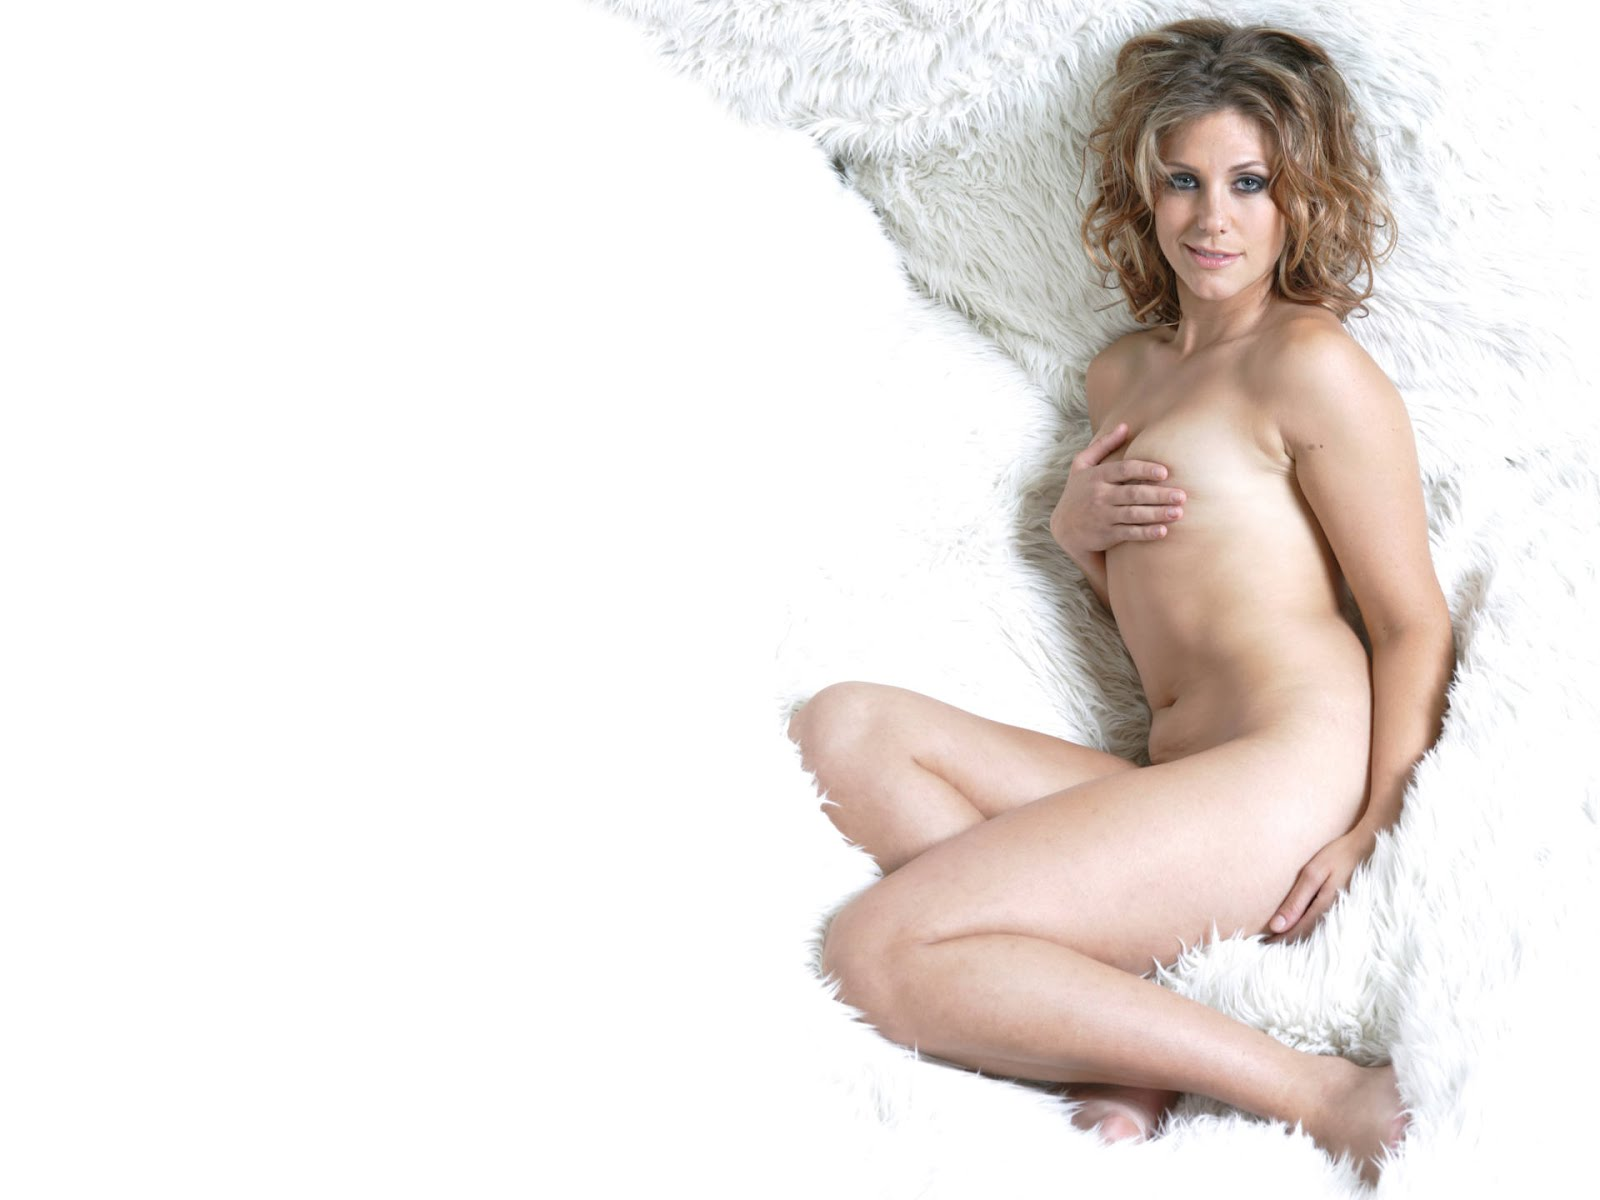 Pornhub women squirting